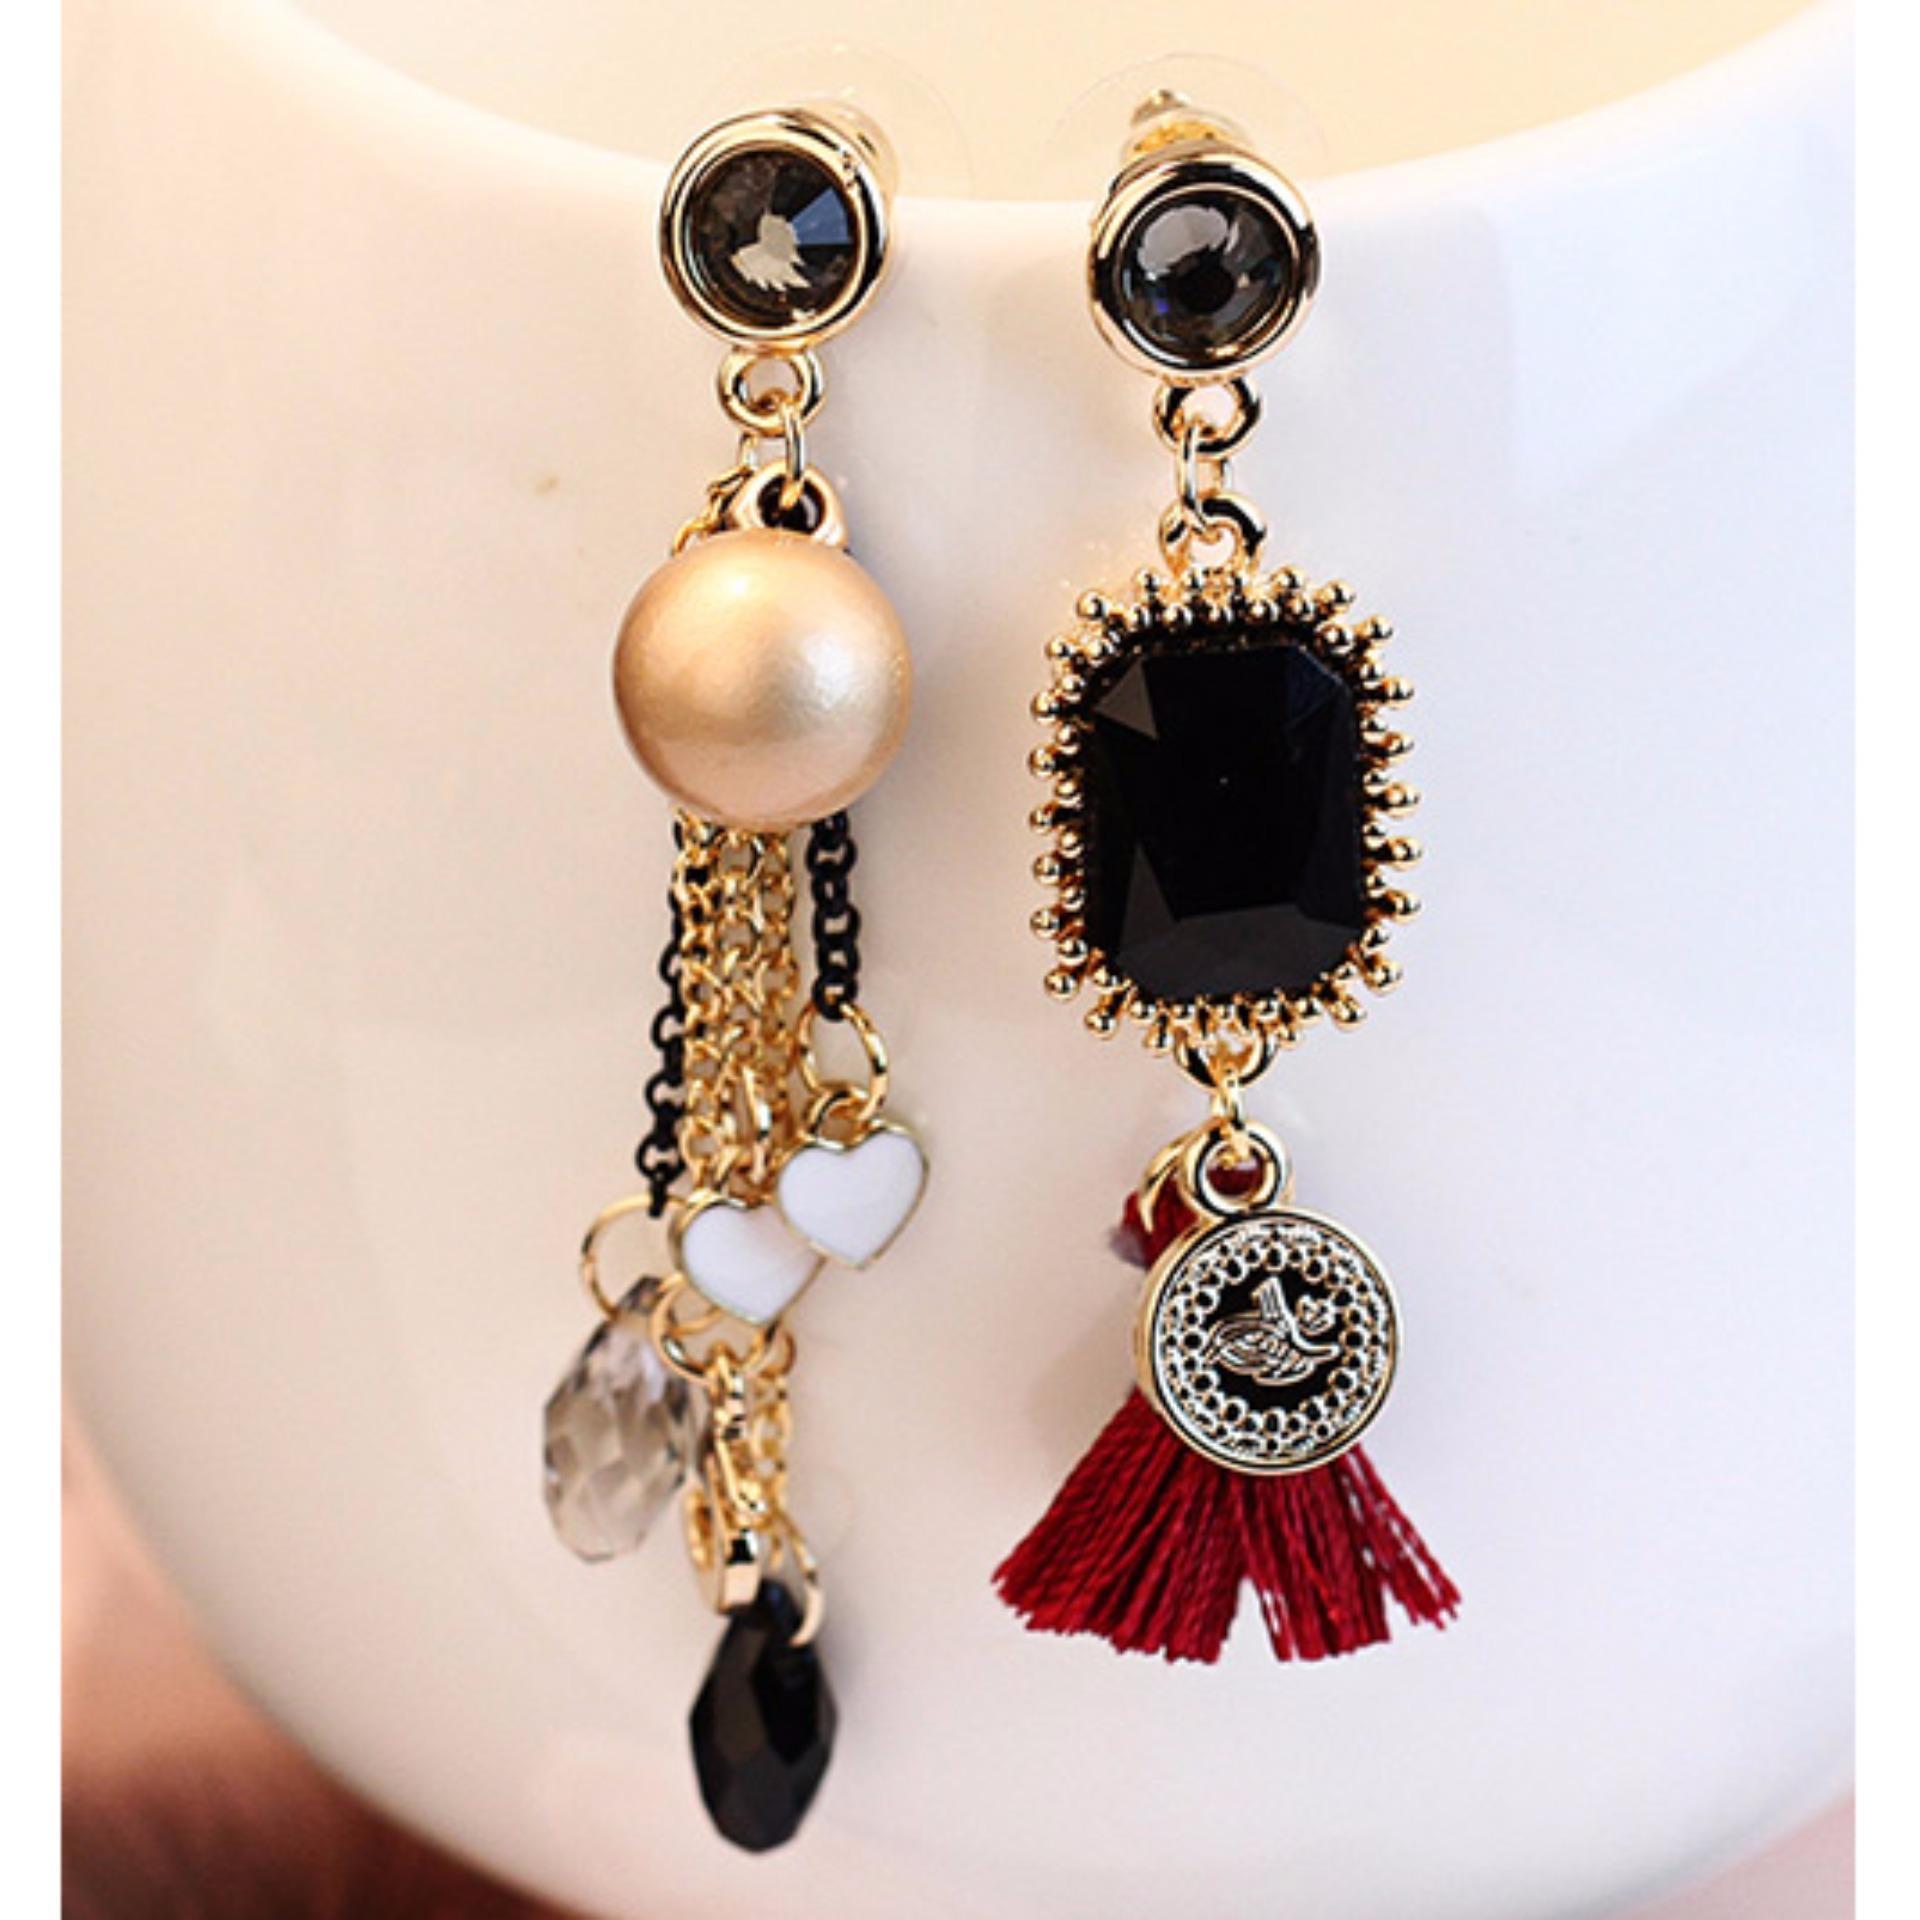 Shock Price LRC Anting Tusuk Fashion Tassel&pearls Decorated Color Matching Earrings penjualan - Hanya Rp30.